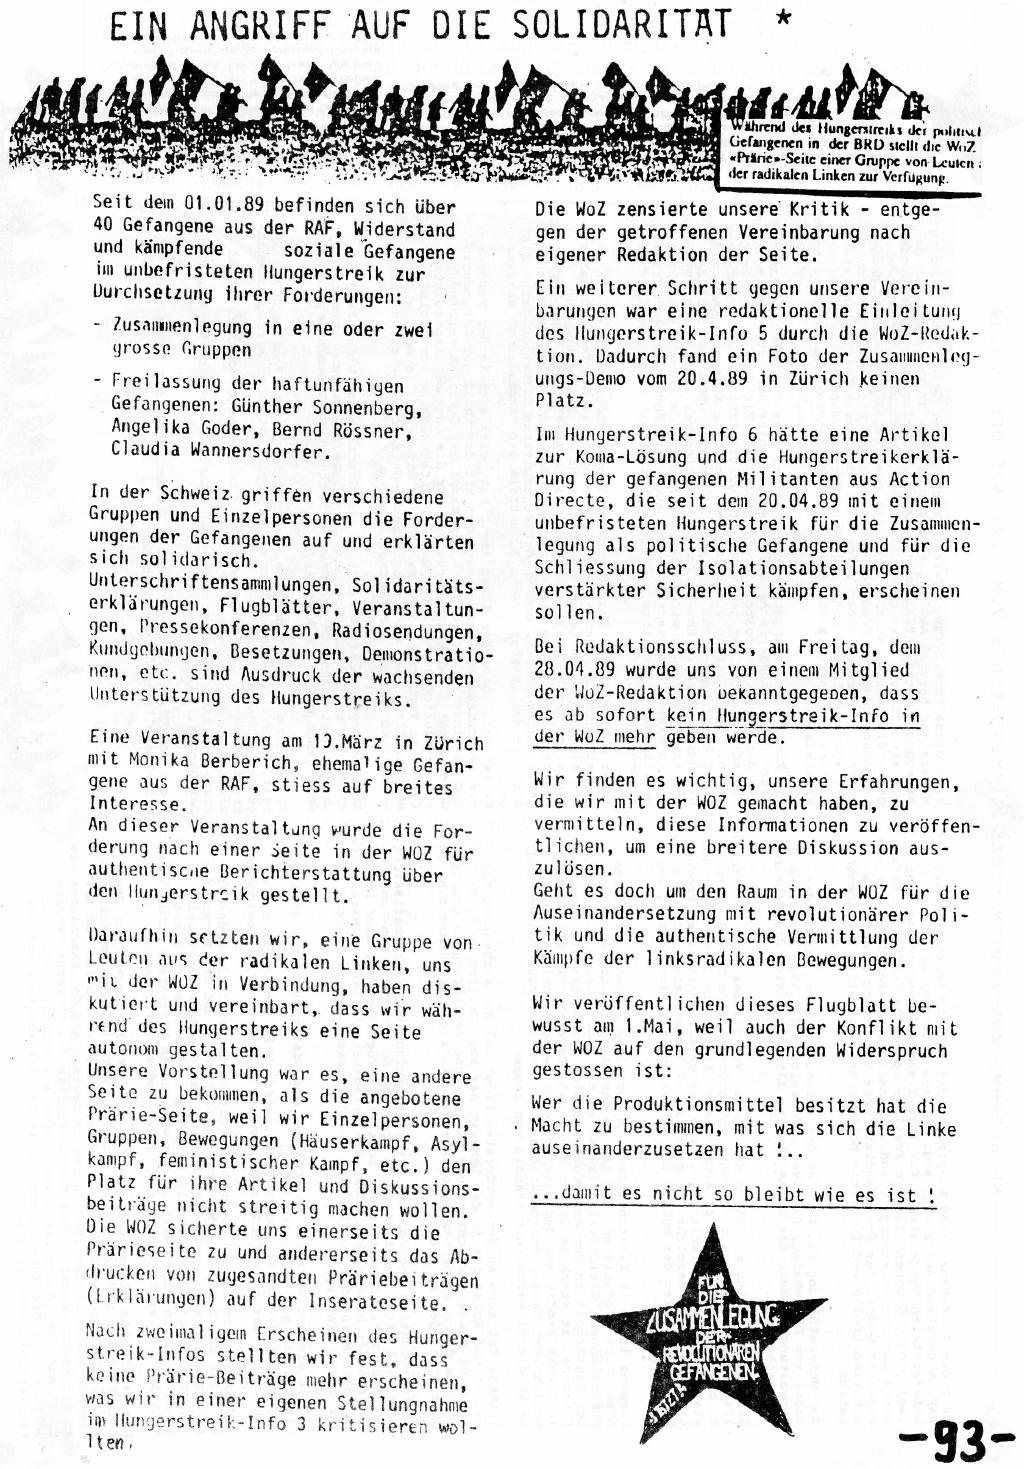 Belgien_Doku_Besetzung_EG_Kommission_1989_095